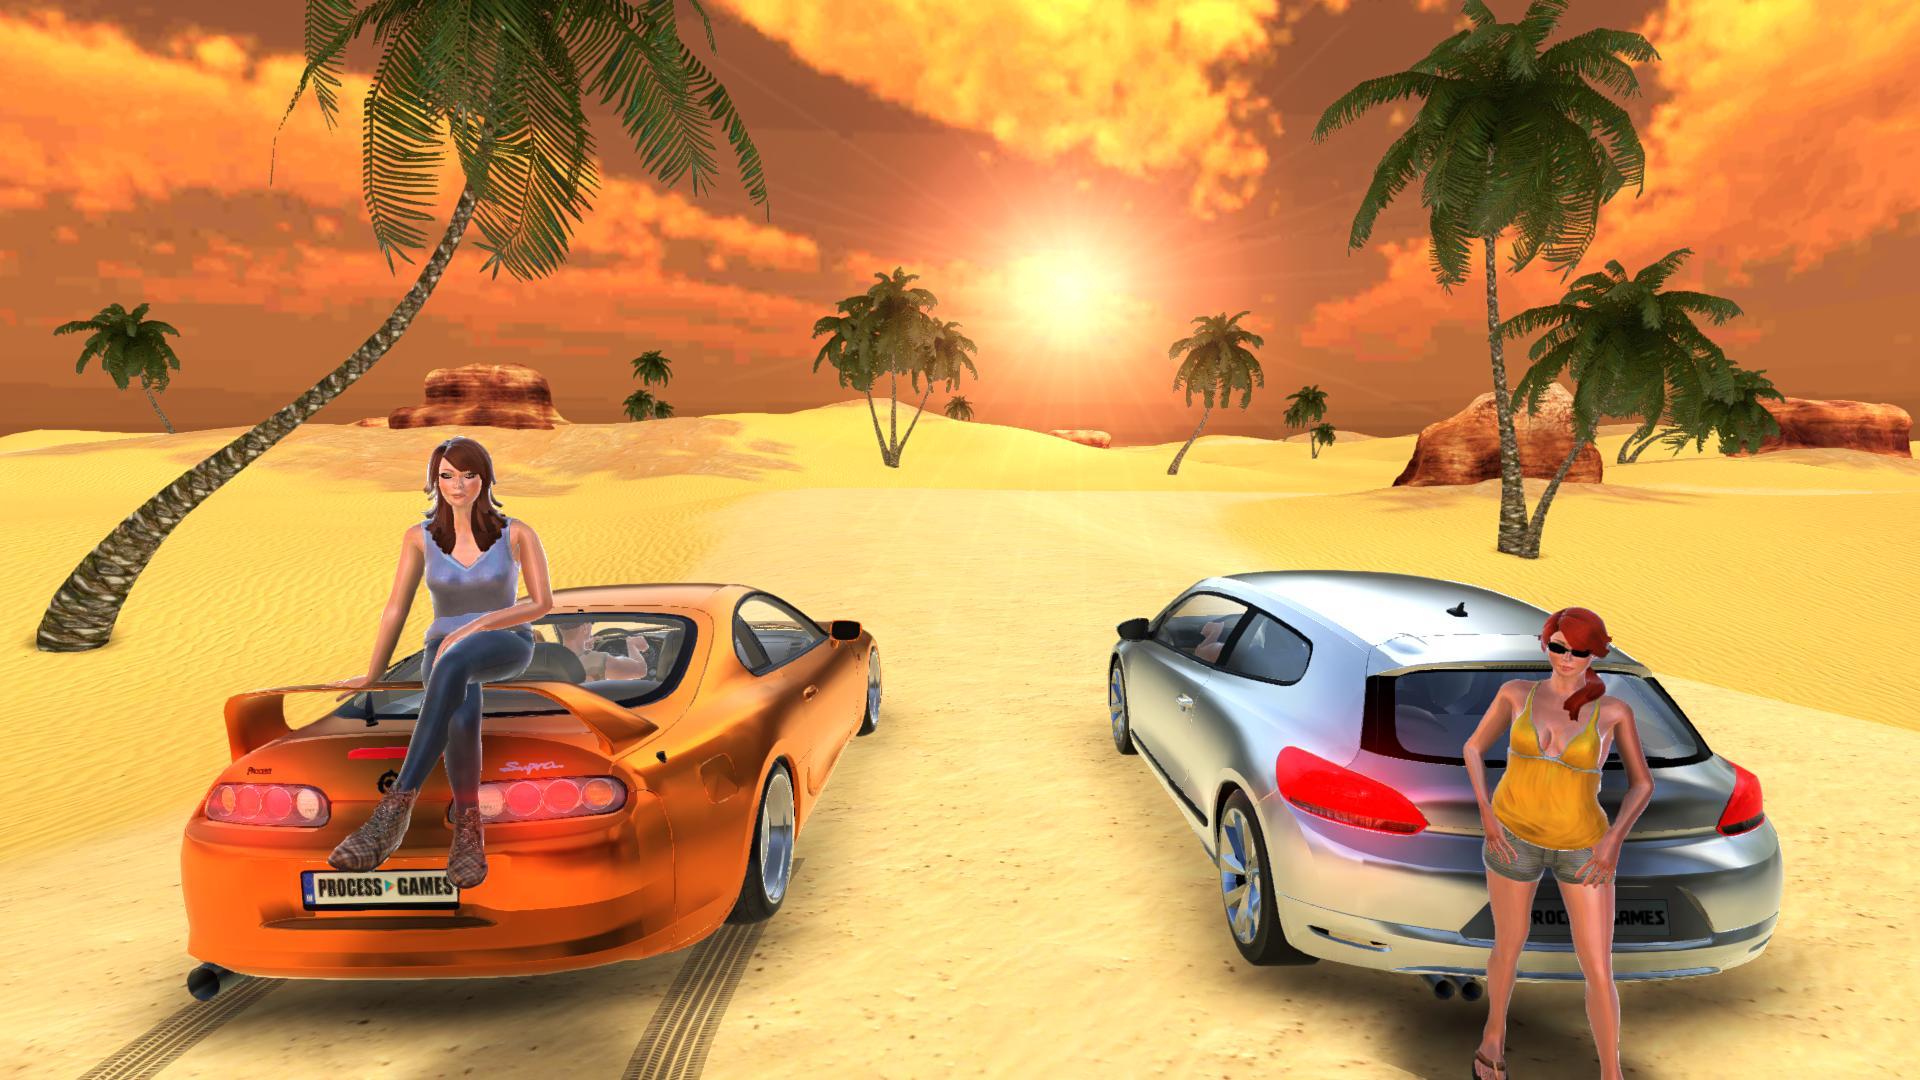 Supra Drift Simulator for Android - APK Download